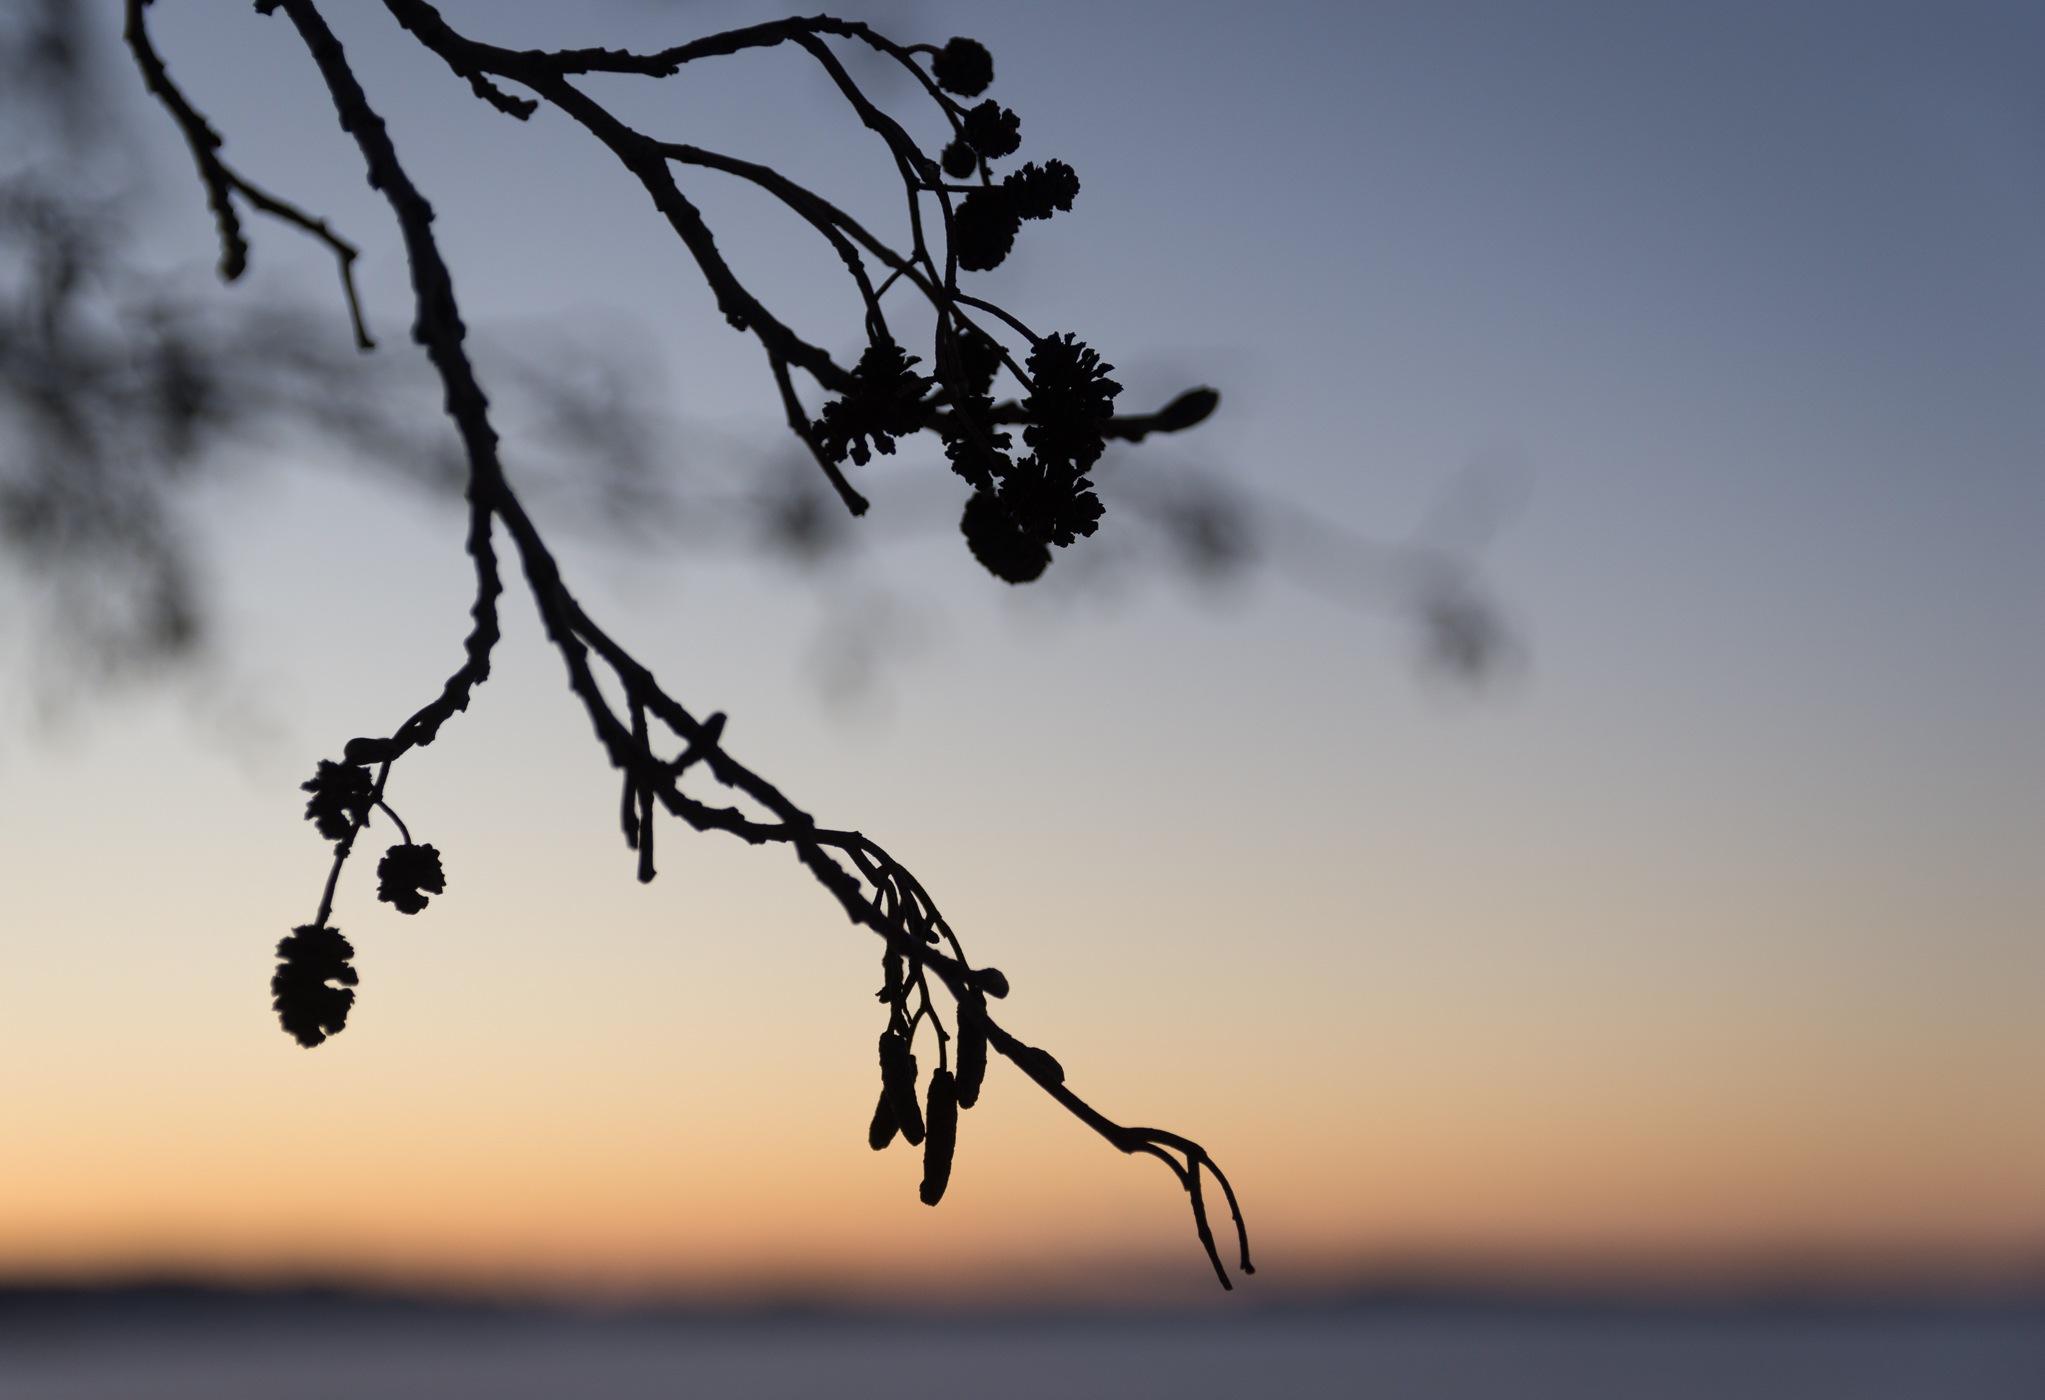 Branch silhouette at sunset by Petri Pihlaja